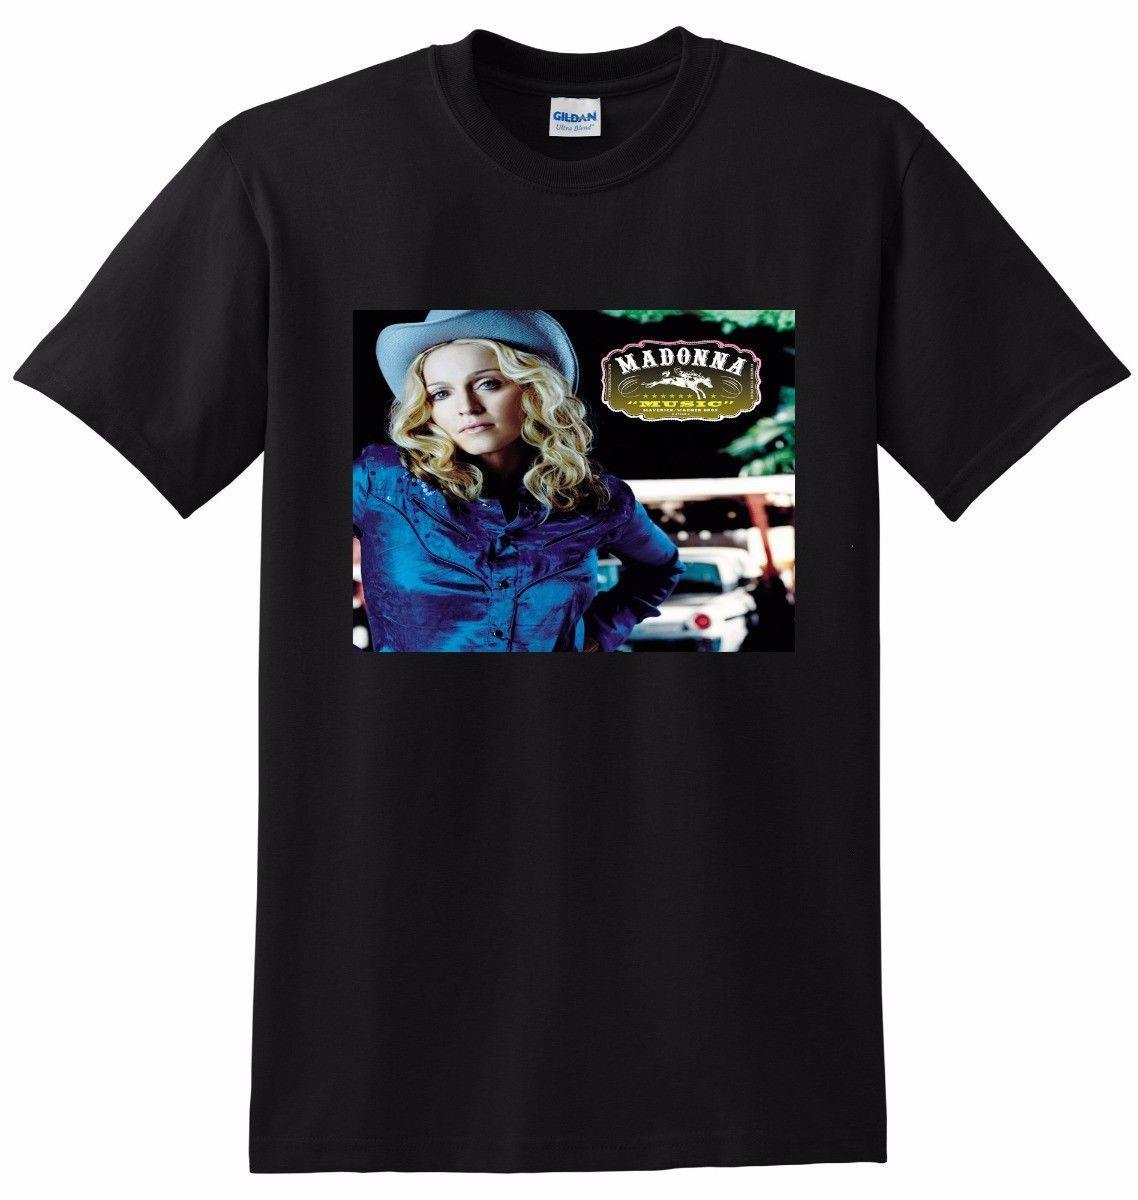 Madonna T Shirt Music Vinyl Cd Cover Tee Small Medium Large O Neck